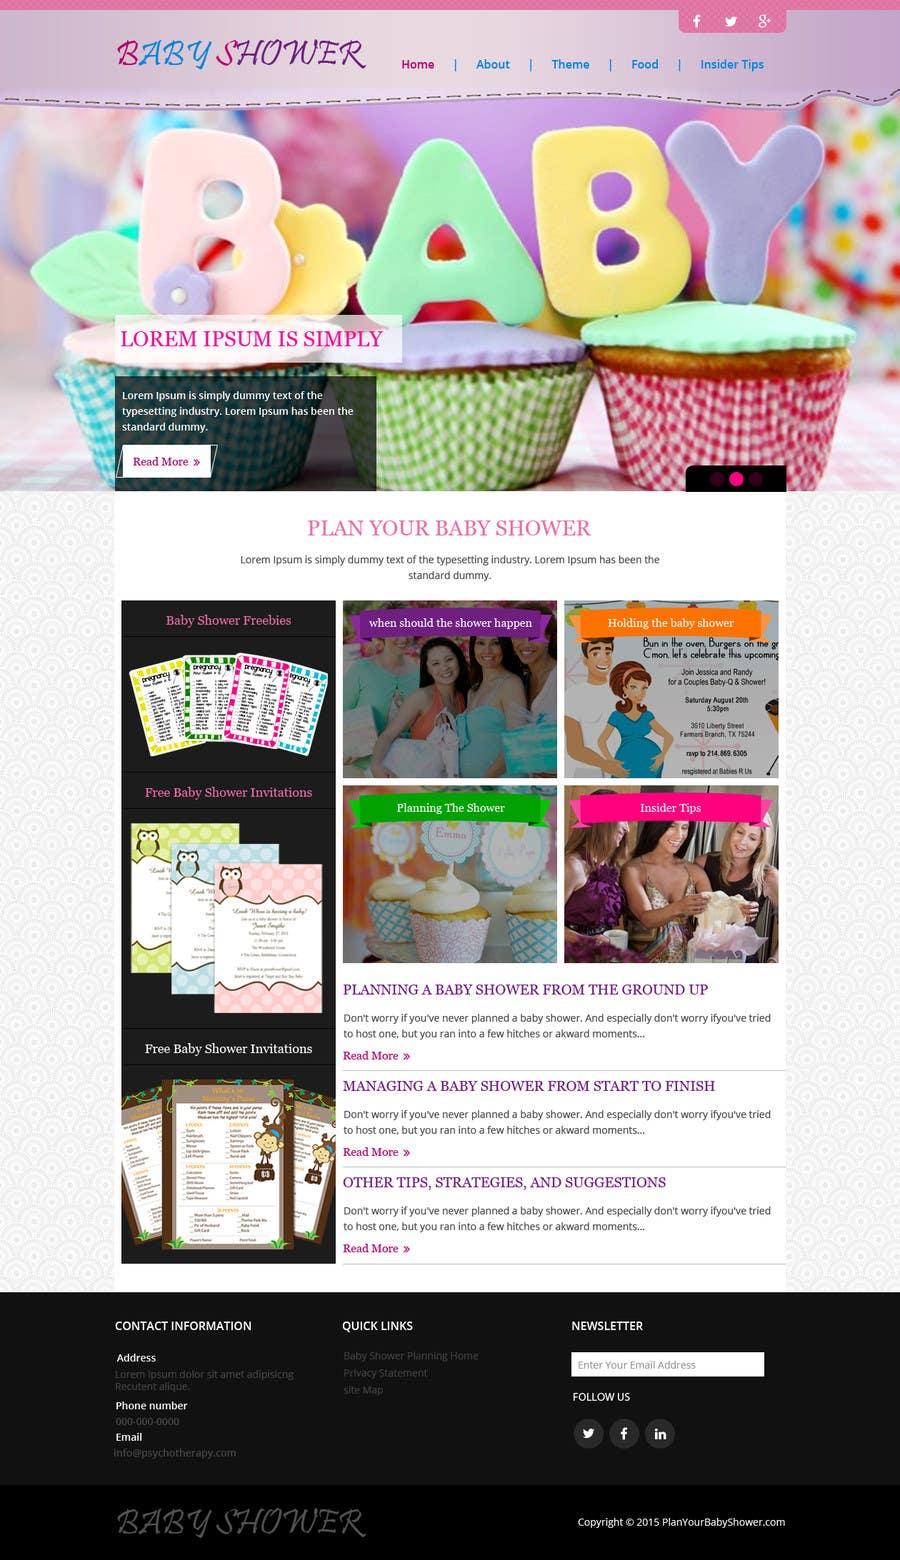 Penyertaan Peraduan #18 untuk Design a Website Mockup for planyourbabyshower.com